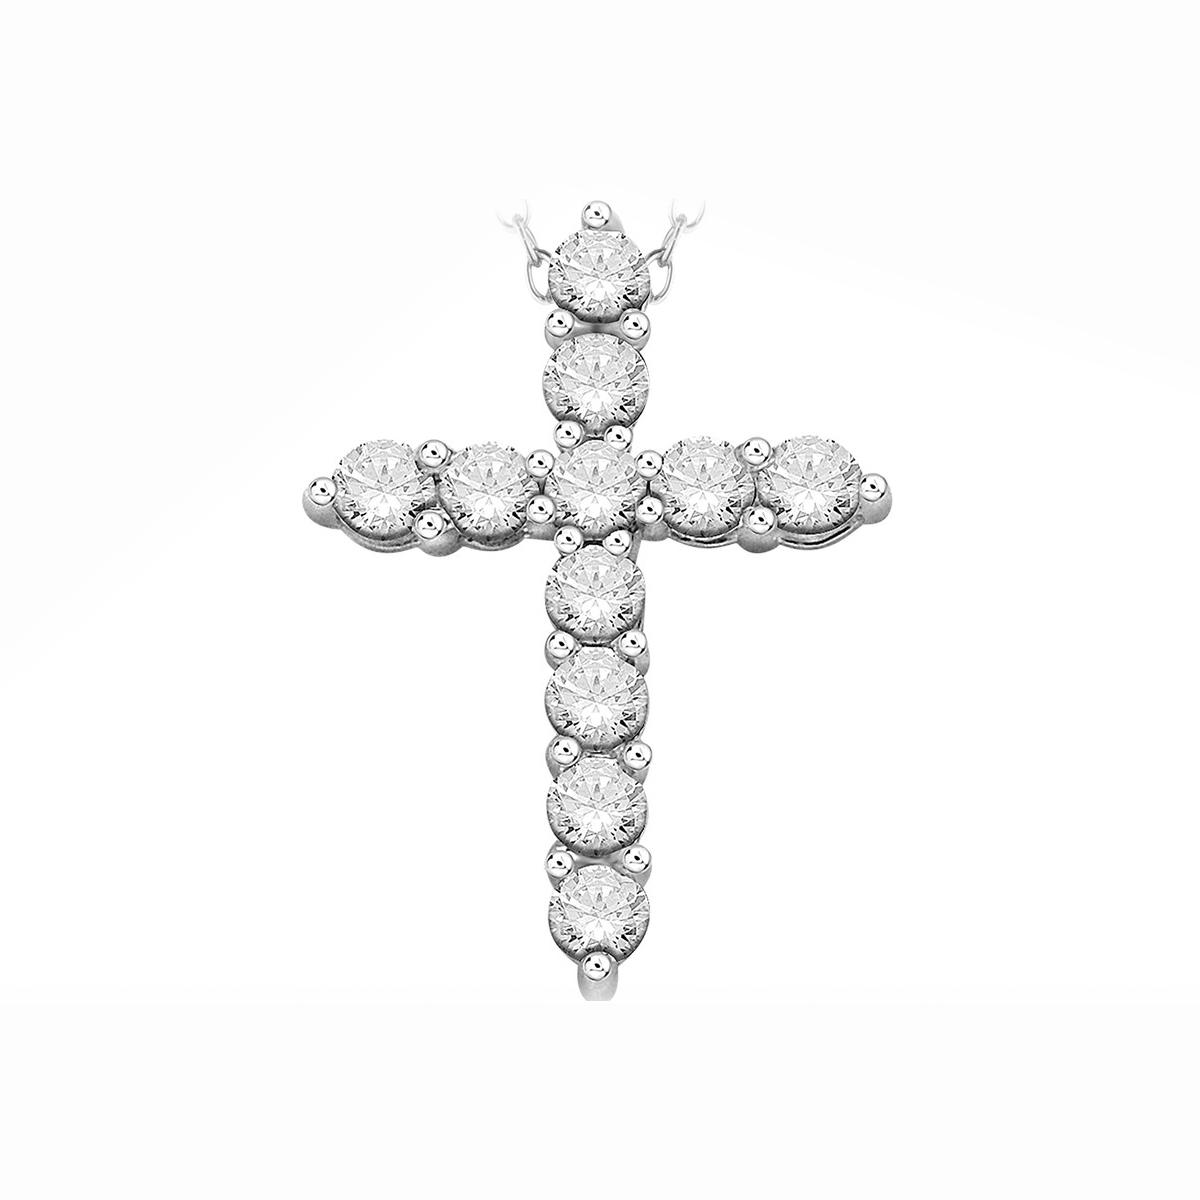 Paramount Gems 14 Karat White Gold 1 Carat Diamond Cross Necklace